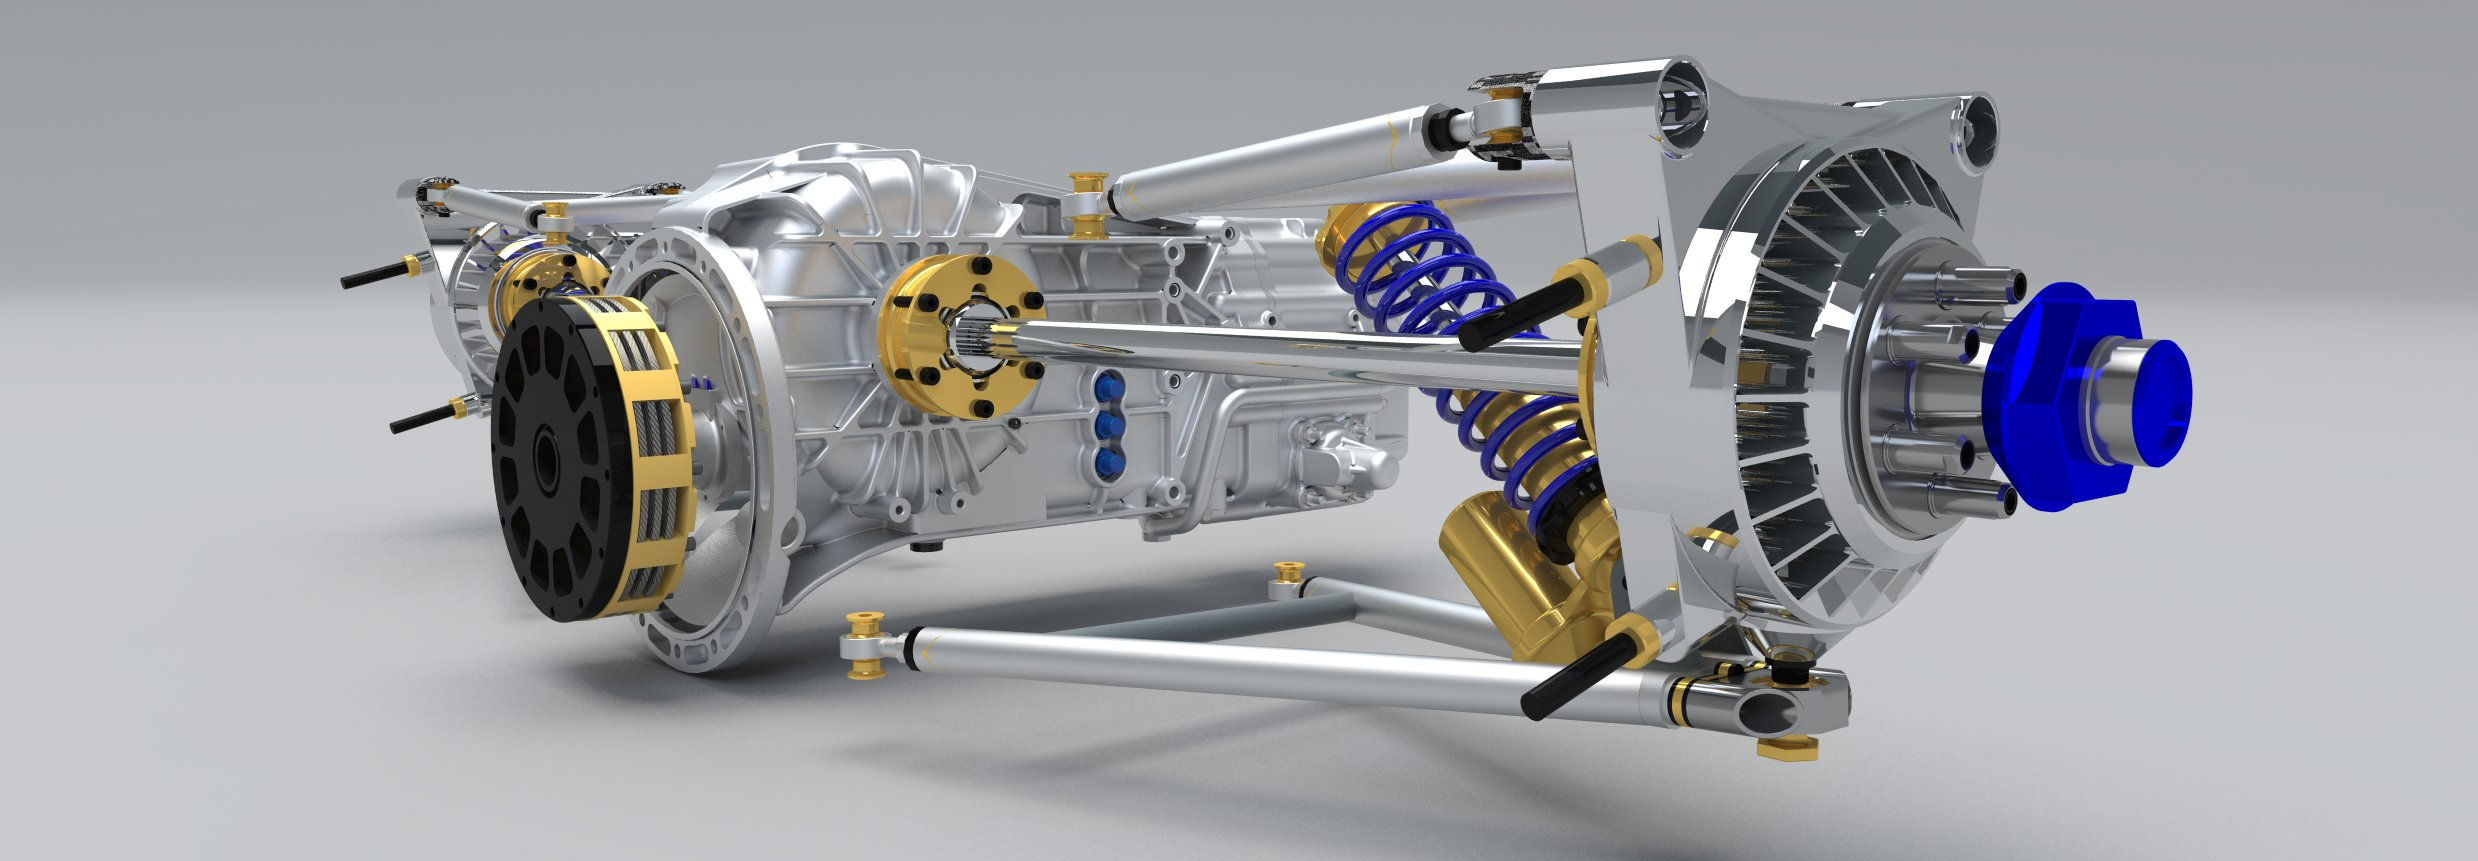 PEASNELL RACING DESIGN _ CONCEPT SKETCH _BMW_RACECAR (9)